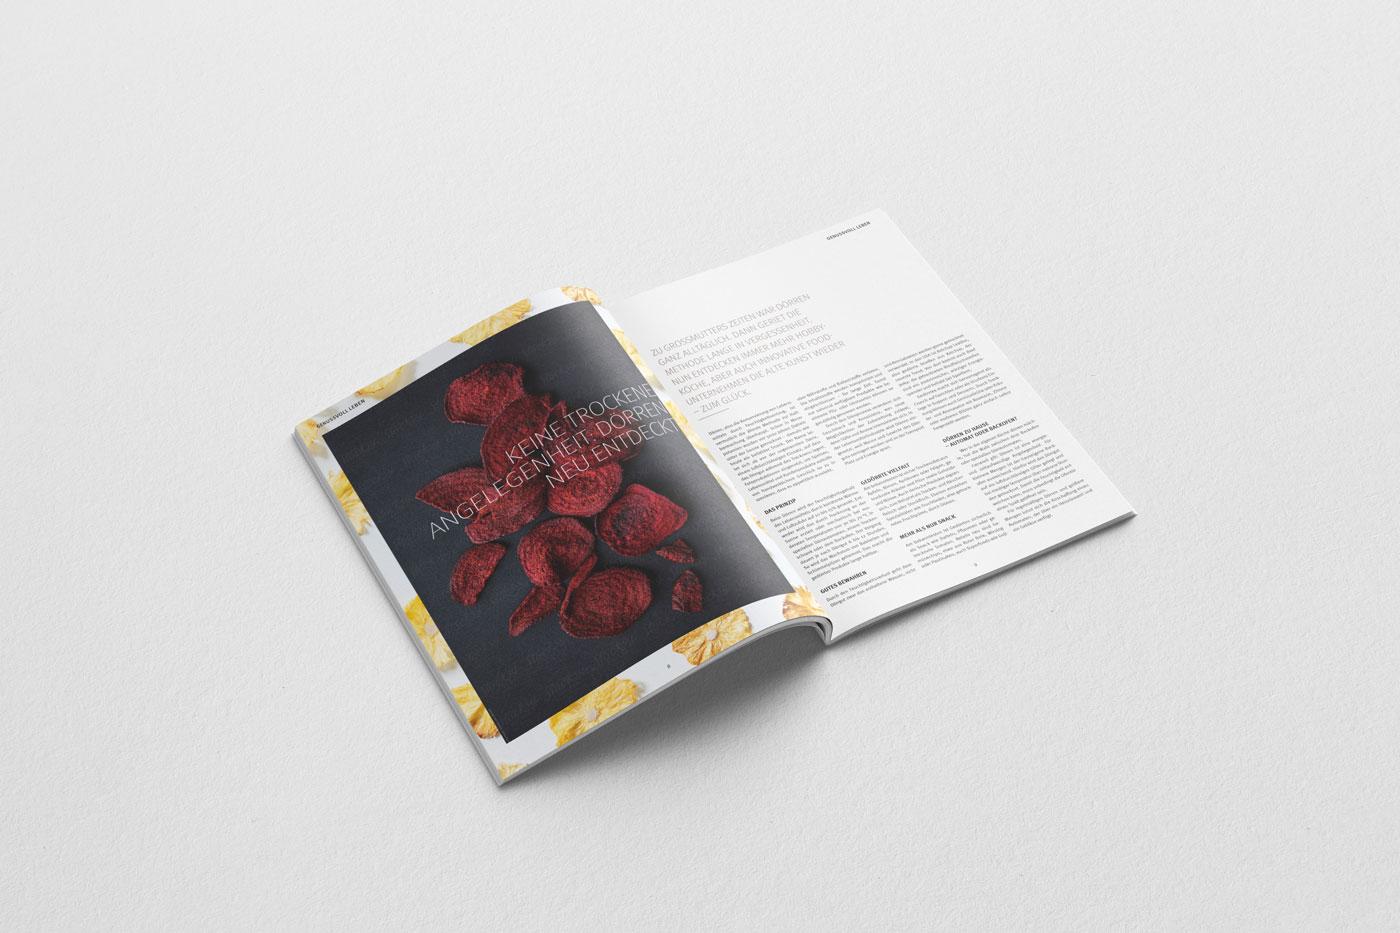 Fissler Kochlust Magazin Editorial Design by studio upstruct